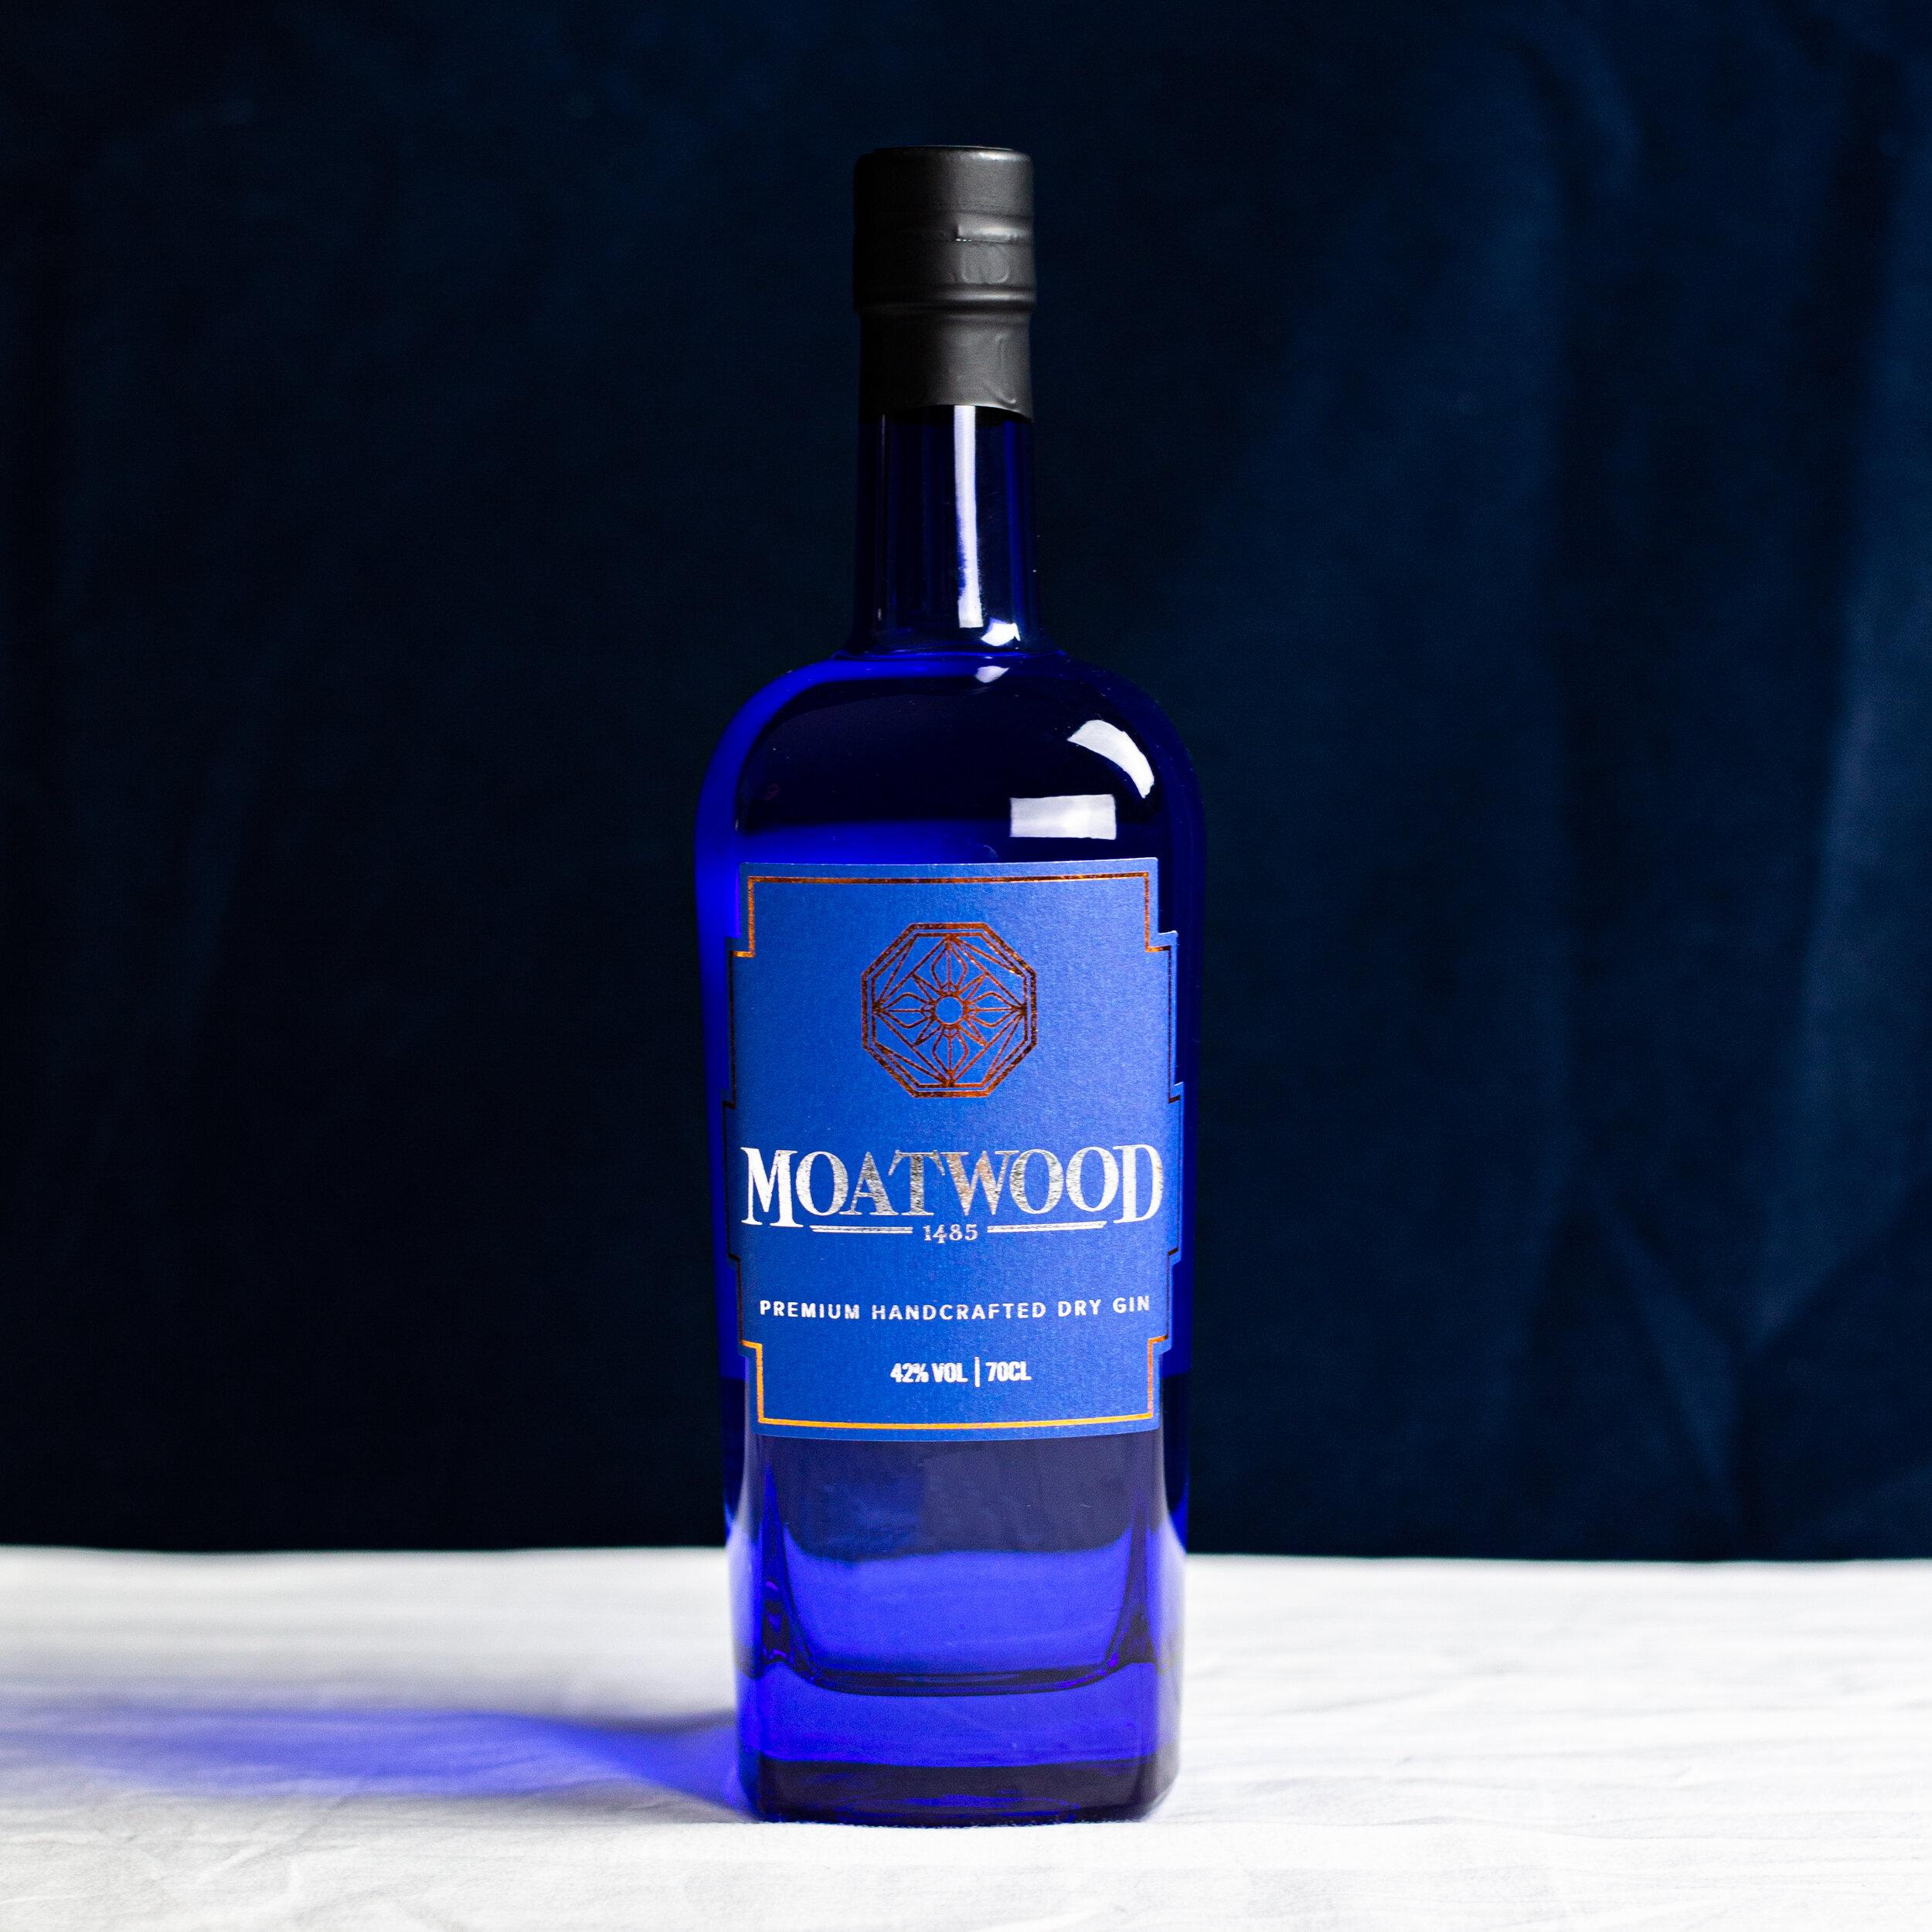 Moatwood-7608-Edit.jpg